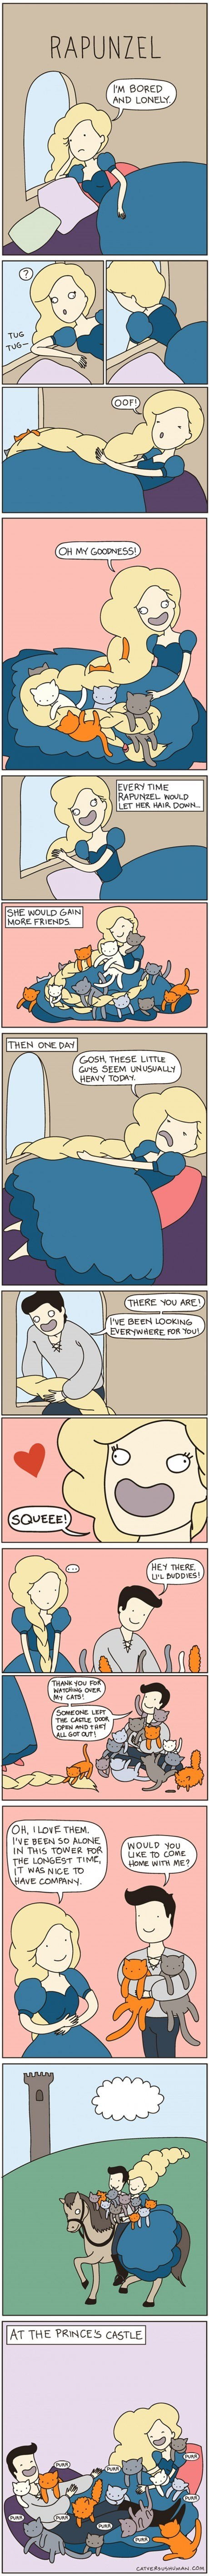 web comics happy endings Cats seems legit - 8111501312